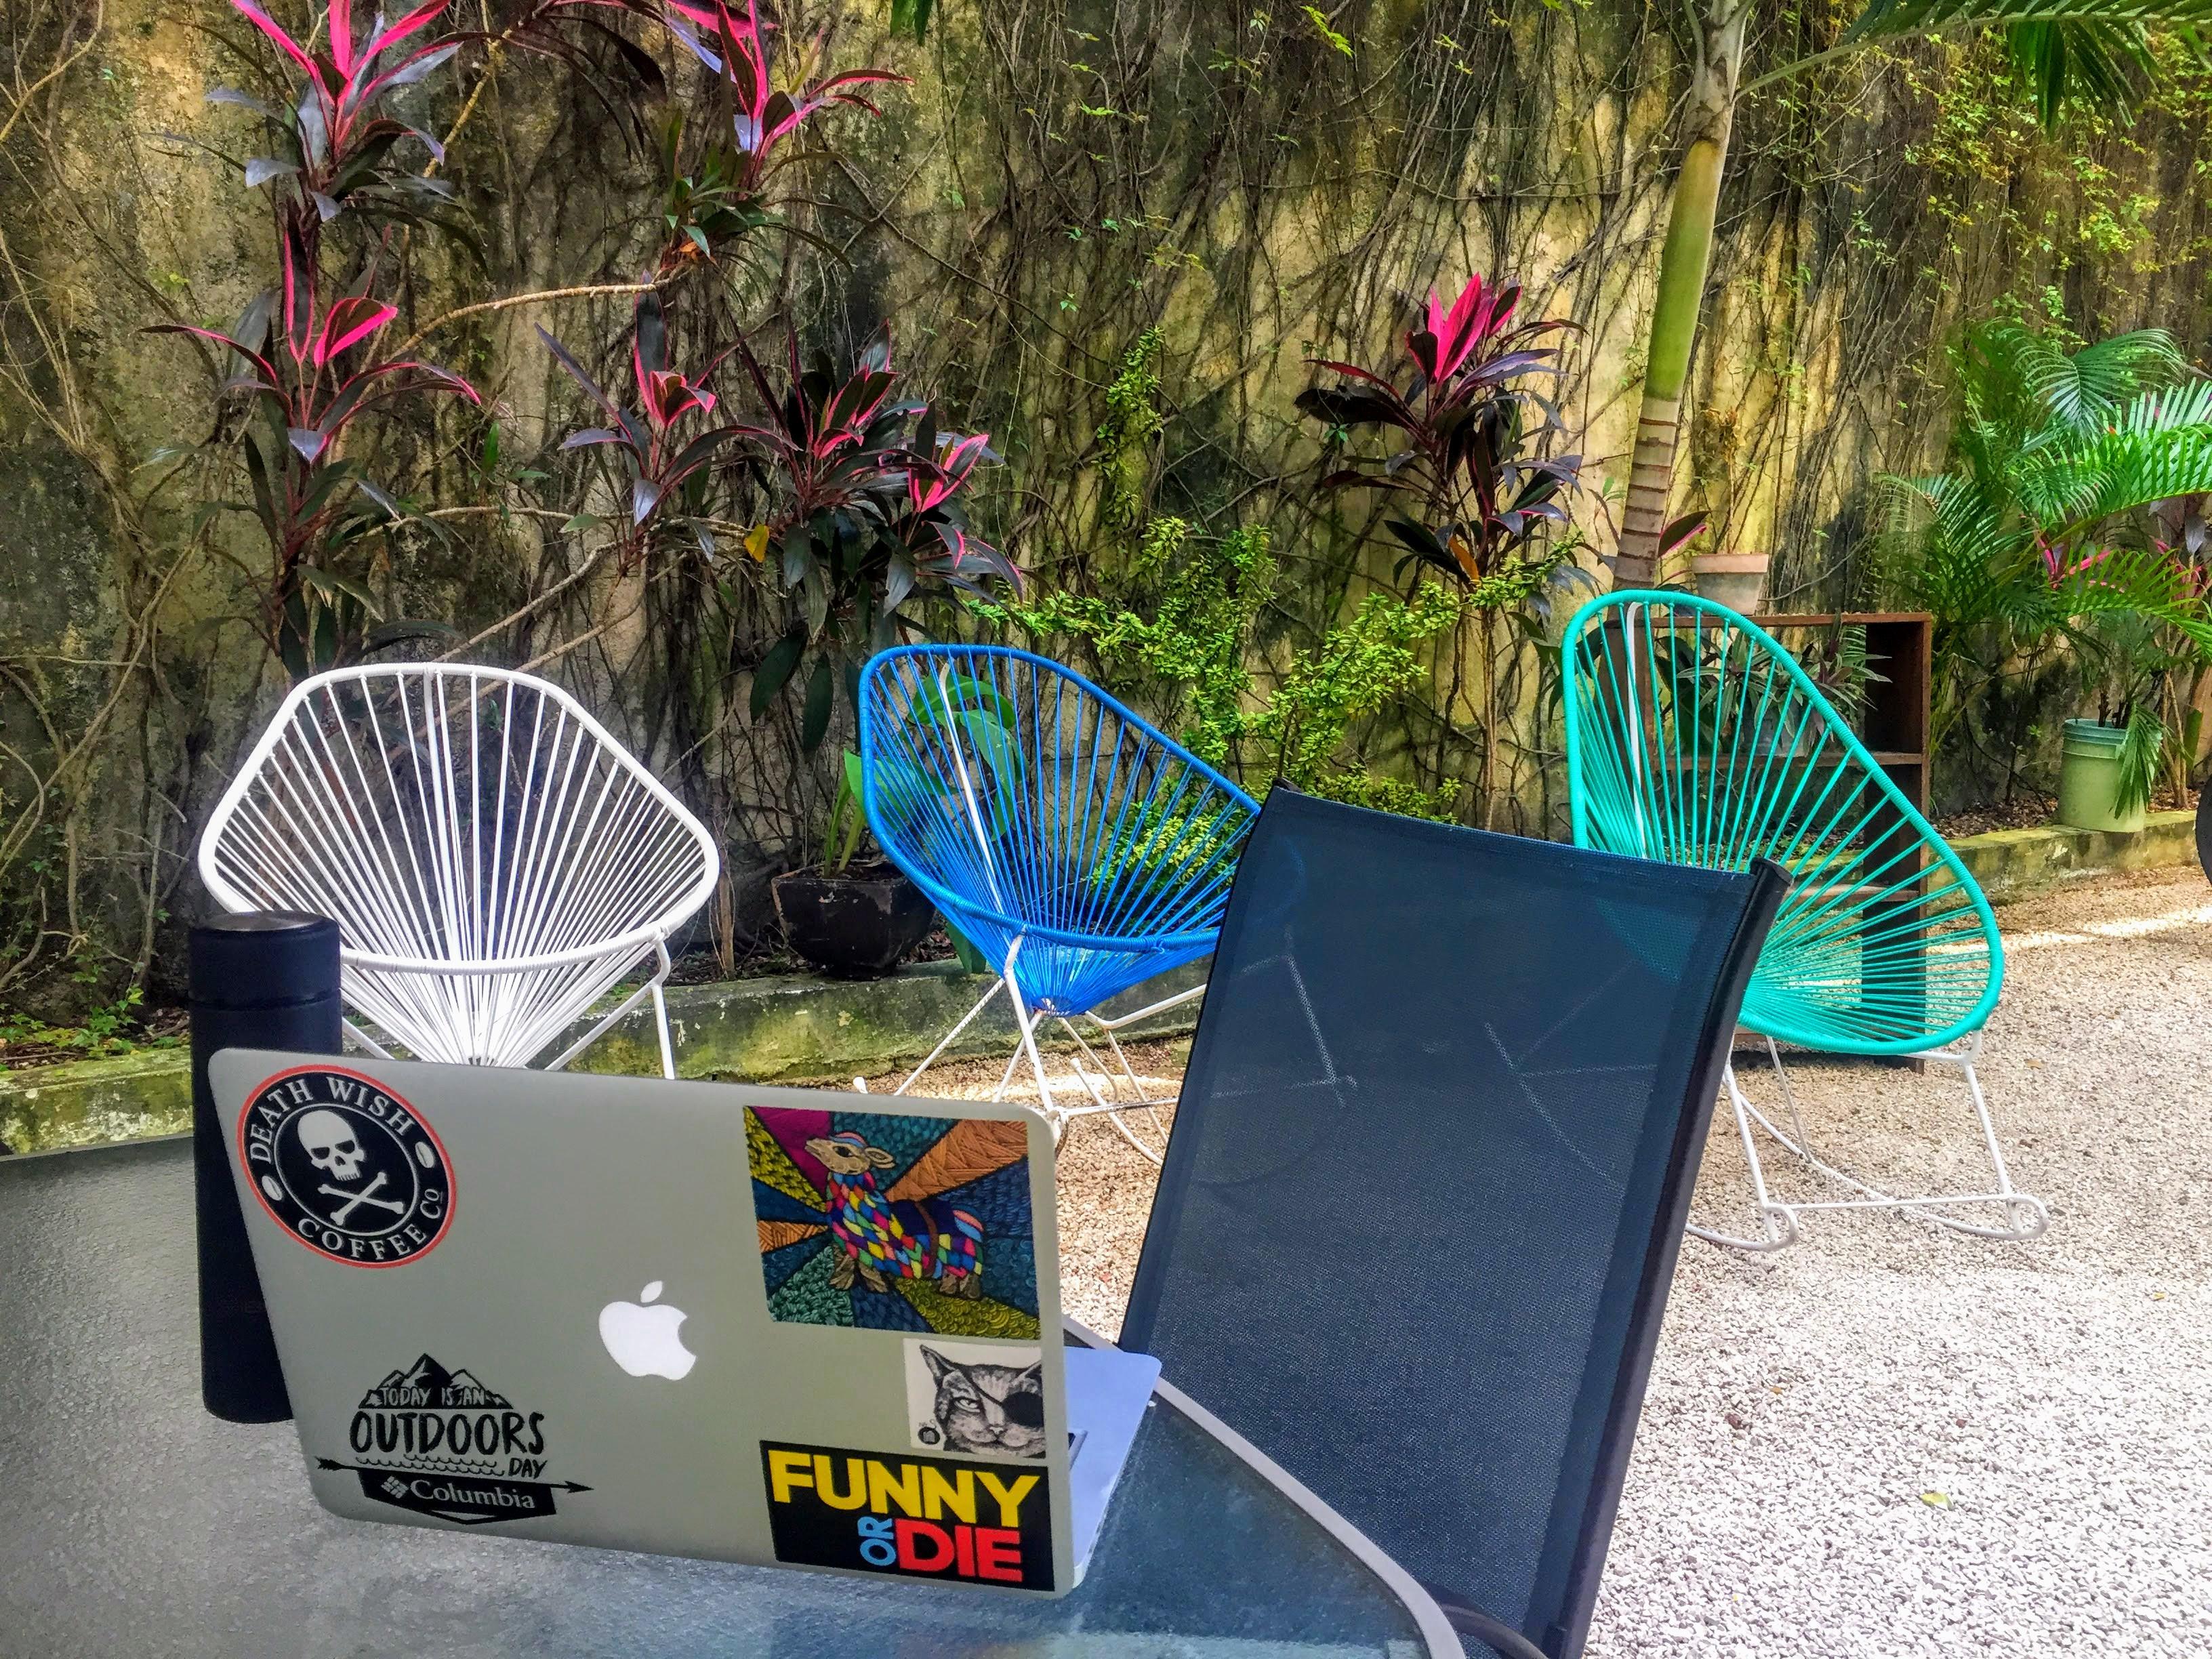 Nest Coworking outdoor space